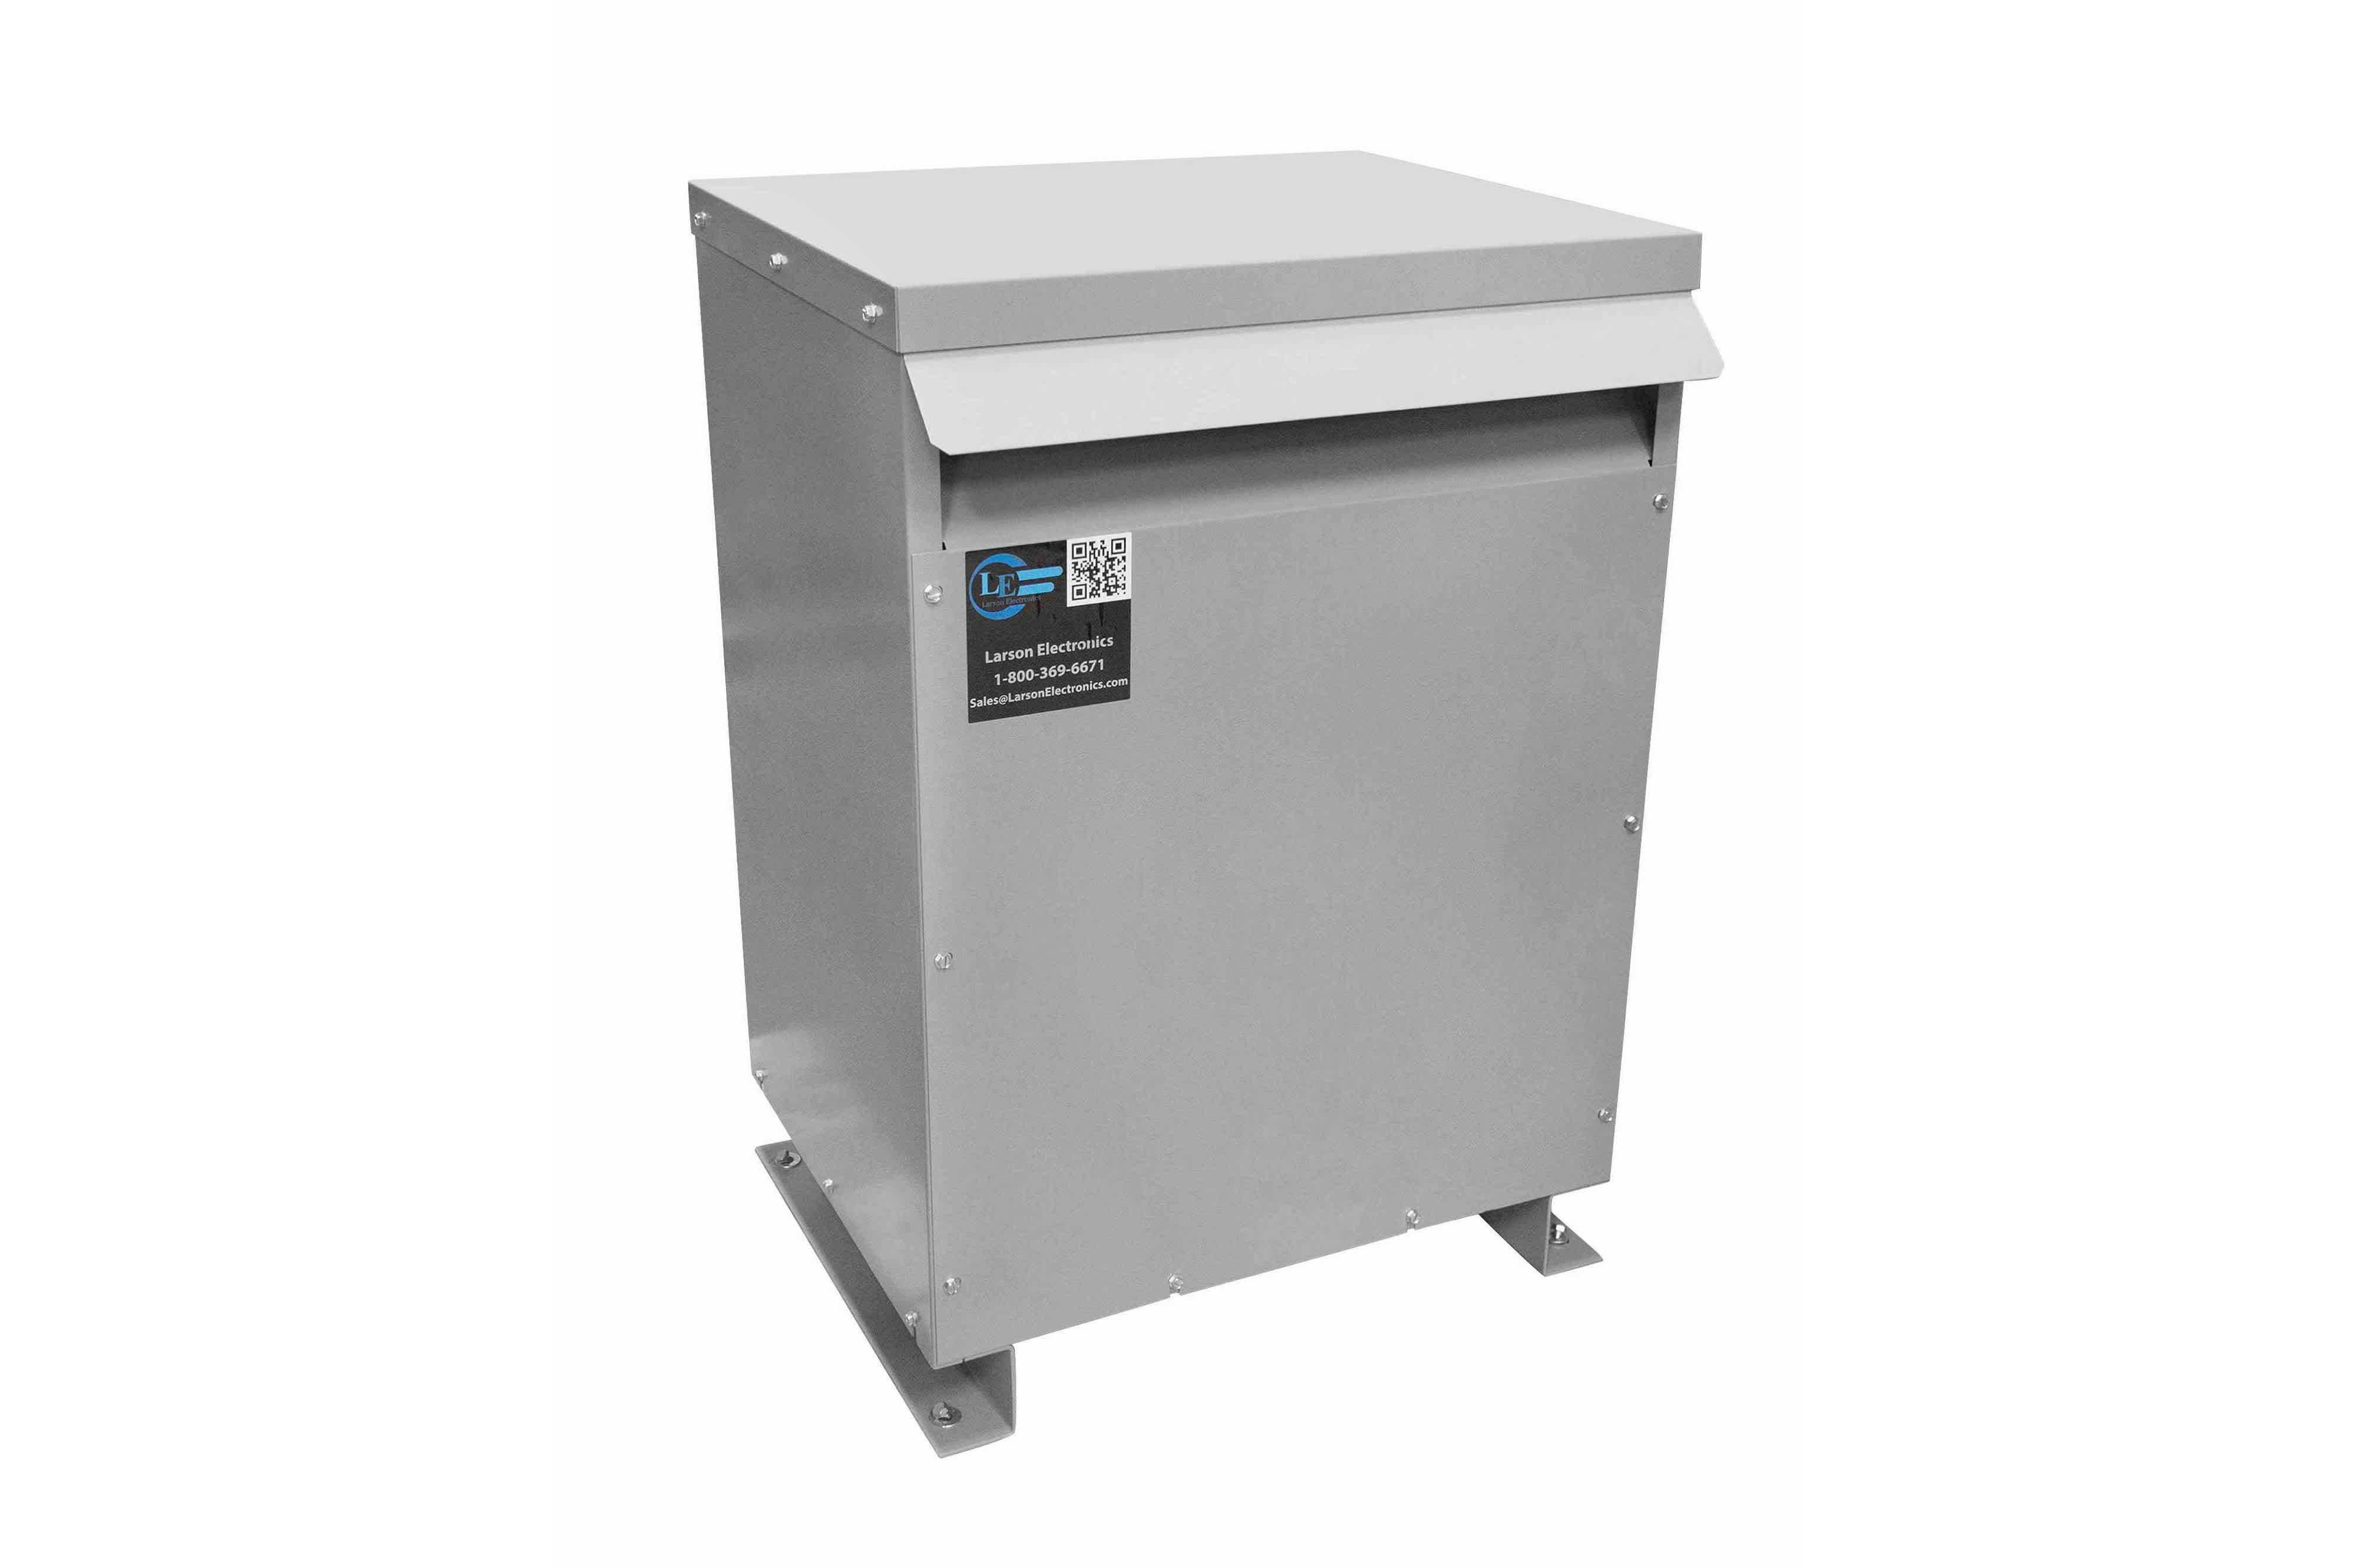 36 kVA 3PH Isolation Transformer, 380V Wye Primary, 600Y/347 Wye-N Secondary, N3R, Ventilated, 60 Hz